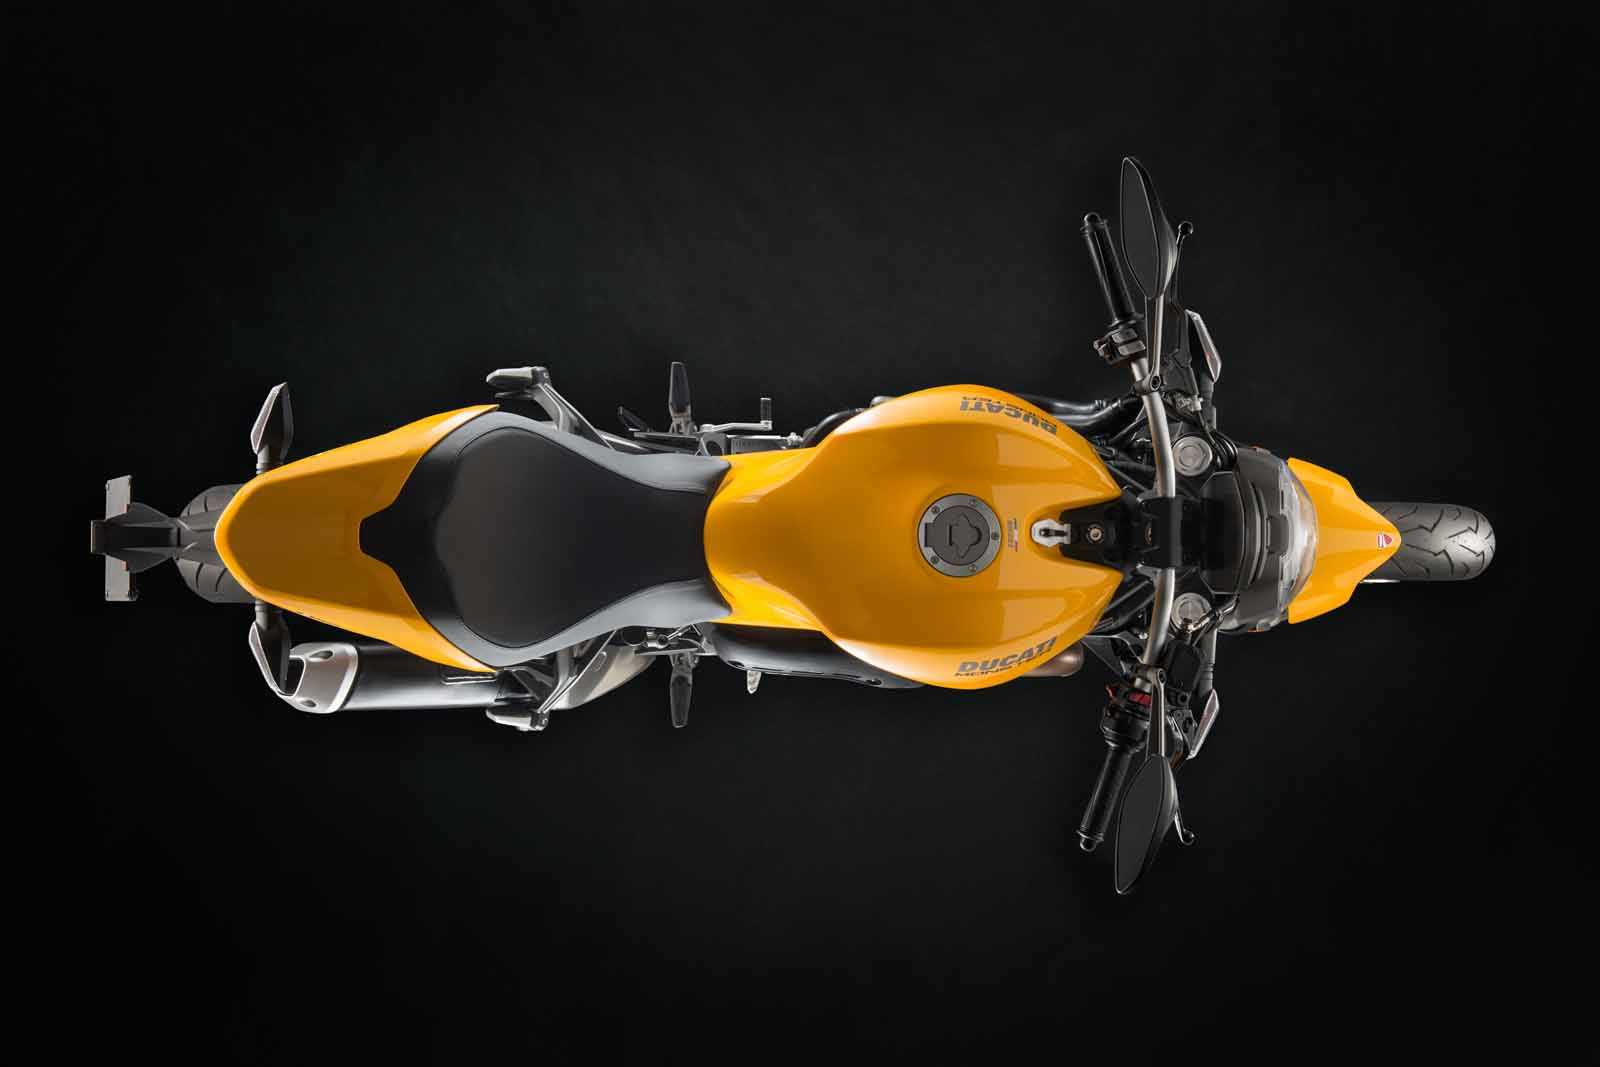 autosport 600x300 photo